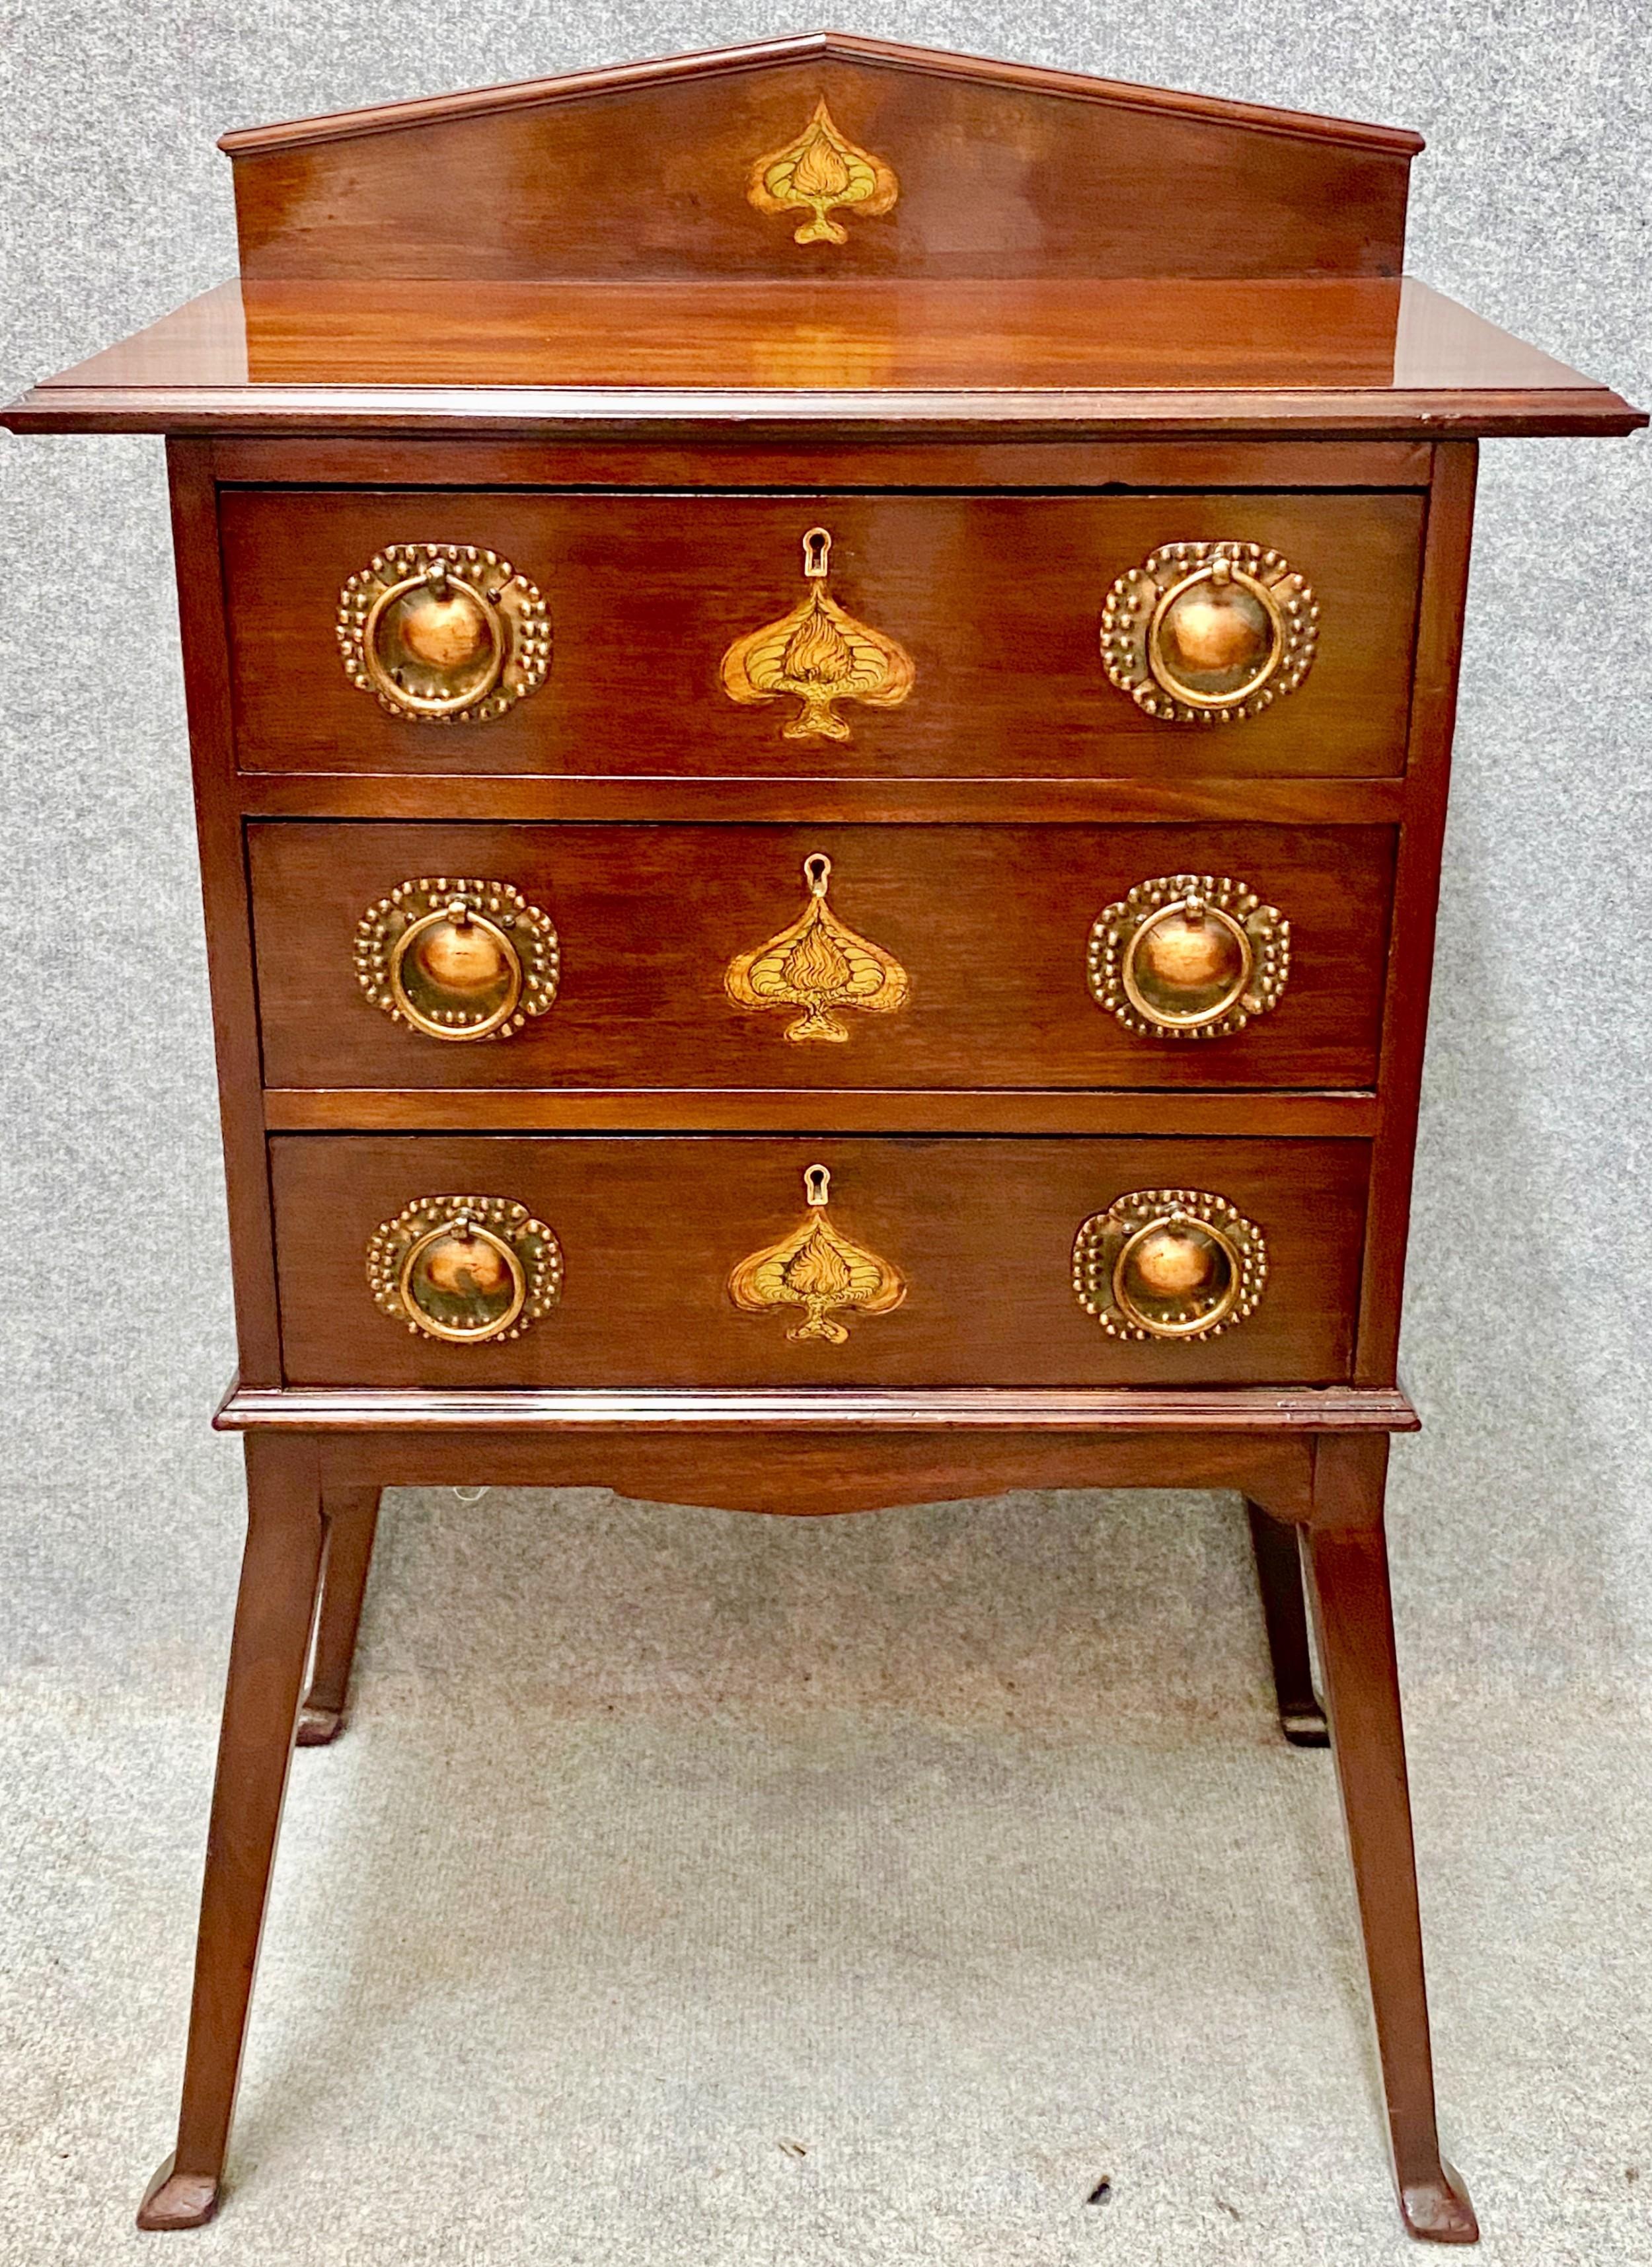 stylish art nouveau mahogany inlaid chest of drawers